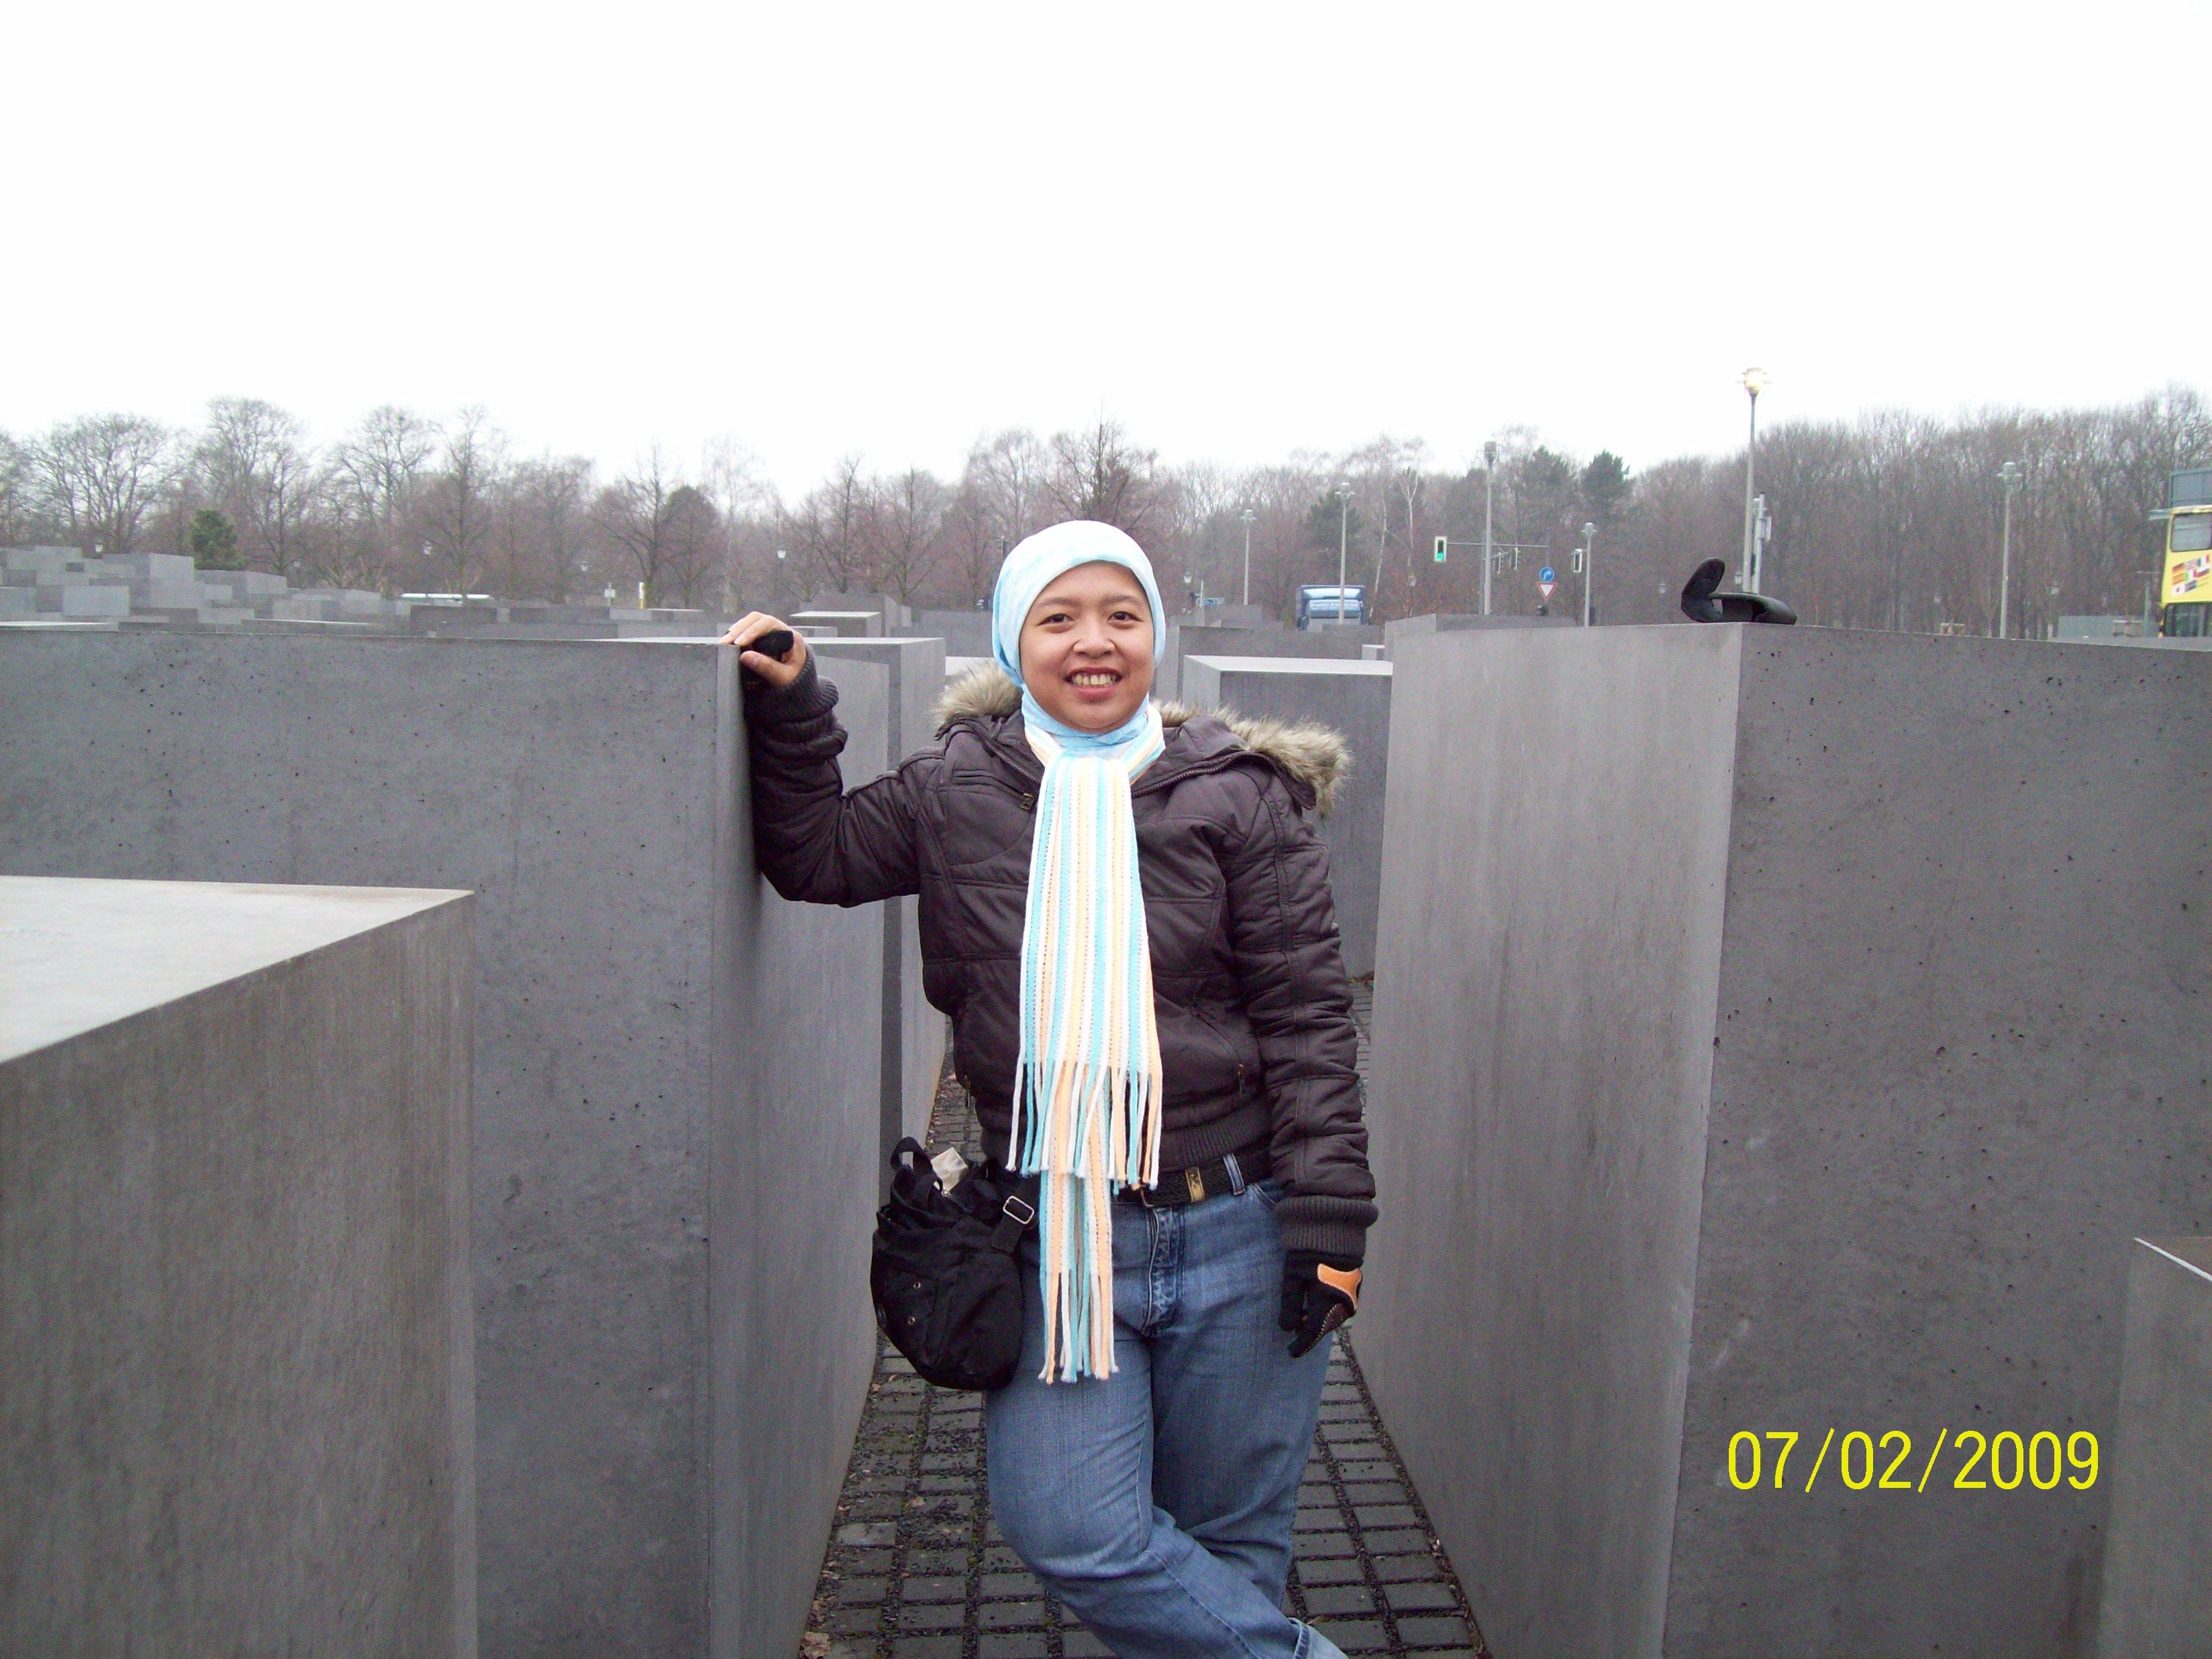 Ririn at the Holocaust Memorial in Berlin